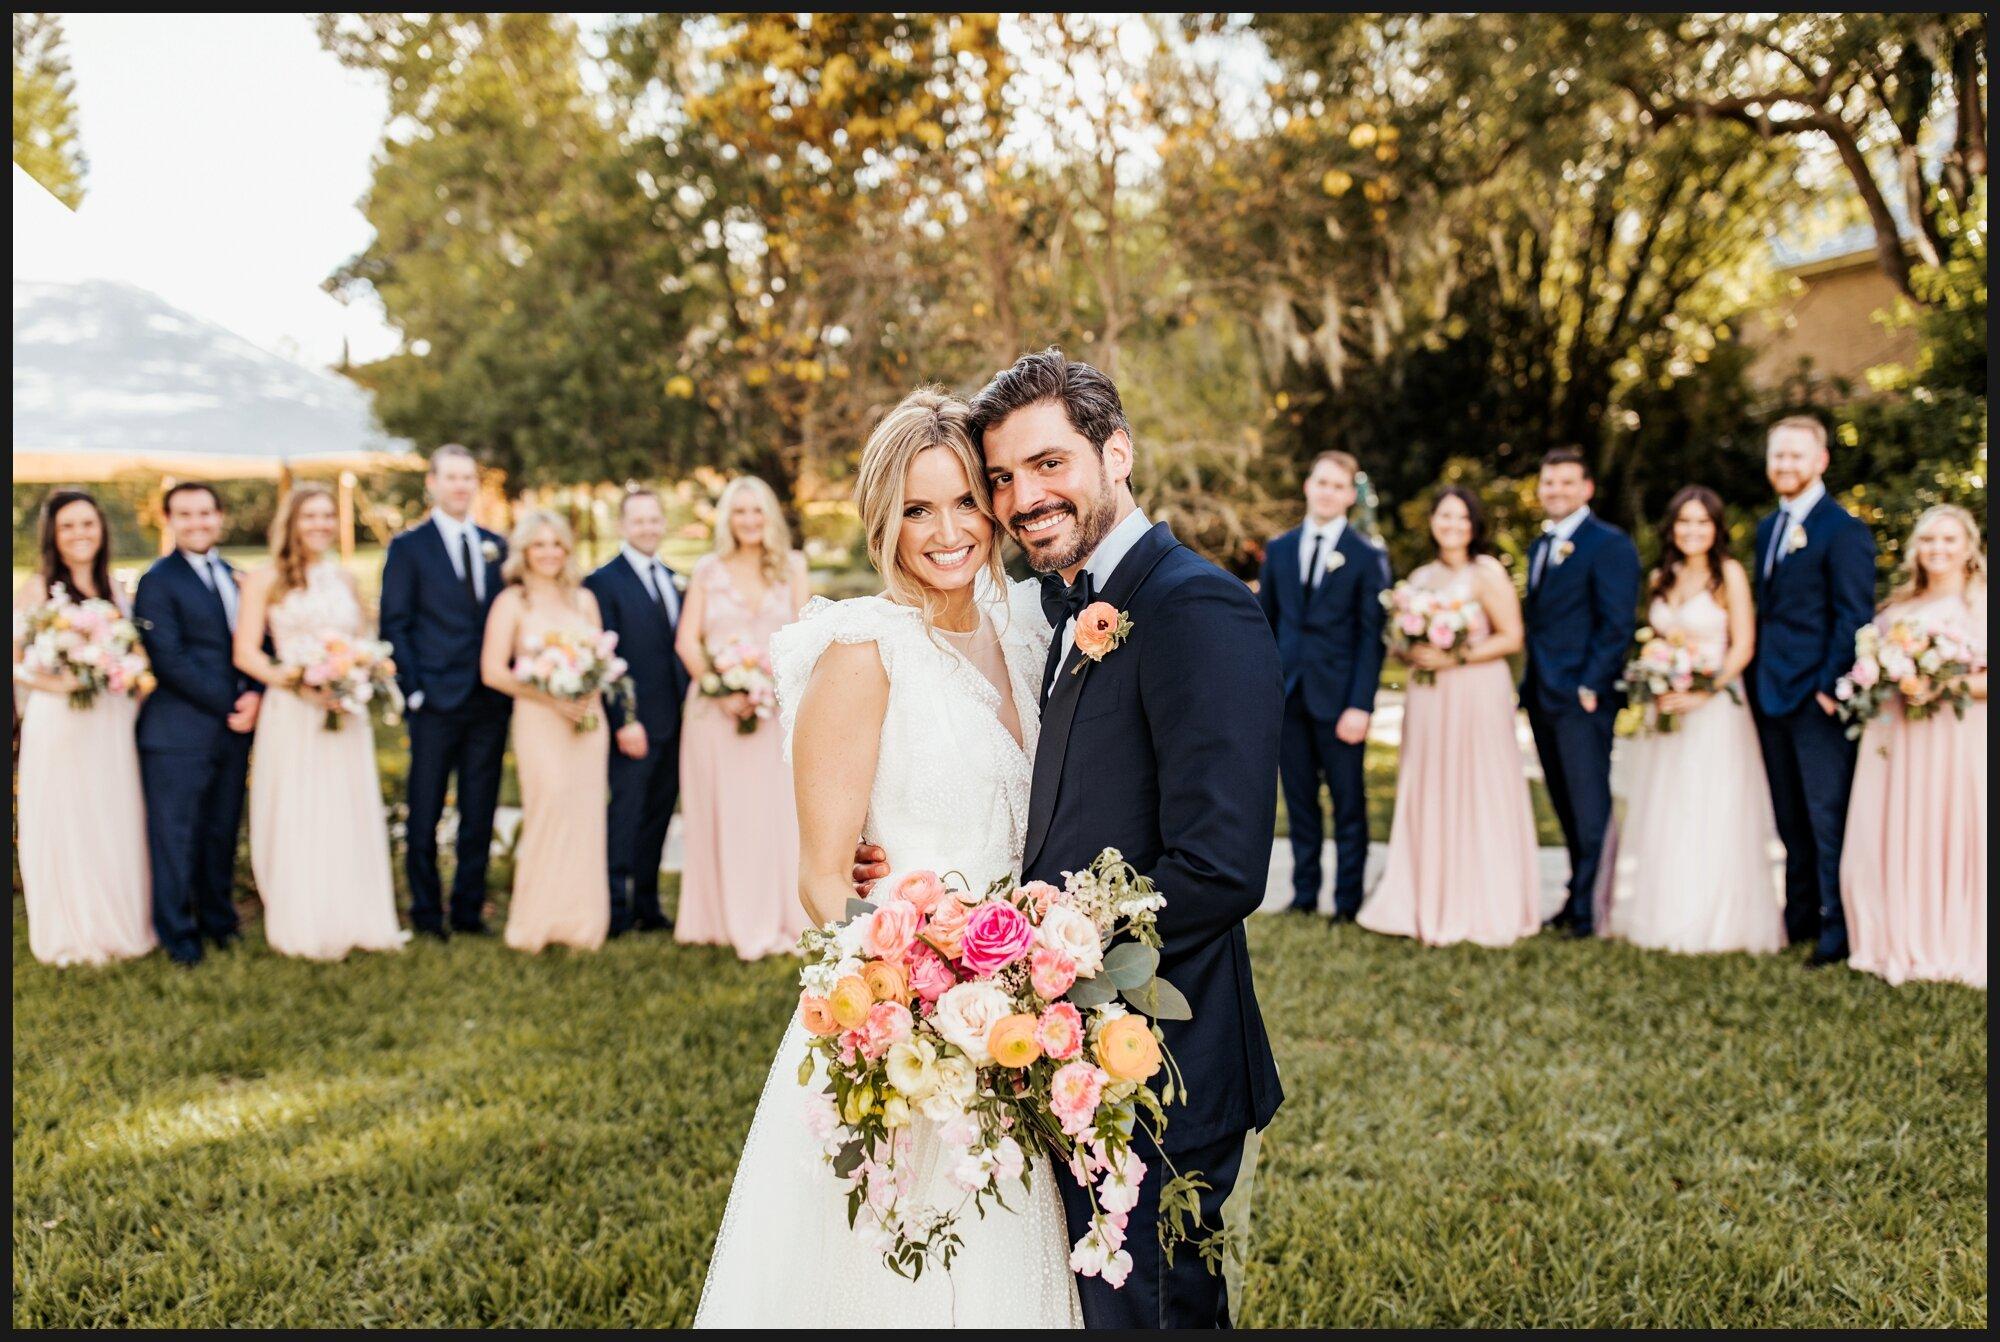 Orlando-Wedding-Photographer-destination-wedding-photographer-florida-wedding-photographer-hawaii-wedding-photographer_0758.jpg